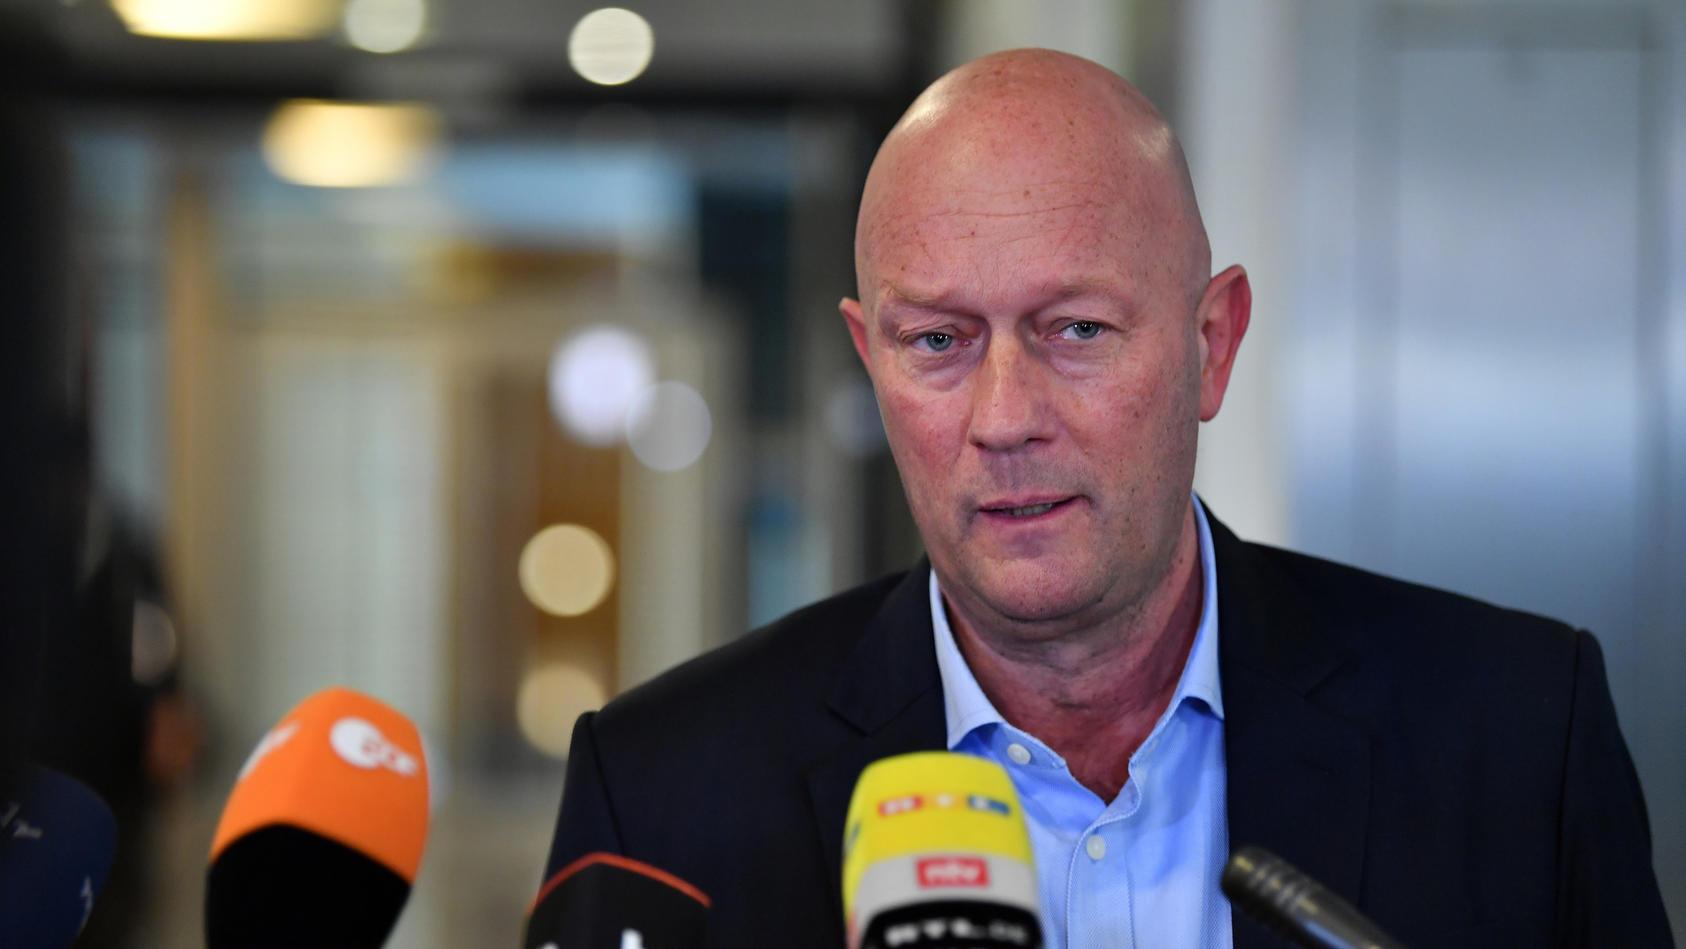 Nach Skandal Wahl In Thuringen Ministerprasident Thomas Kemmerich